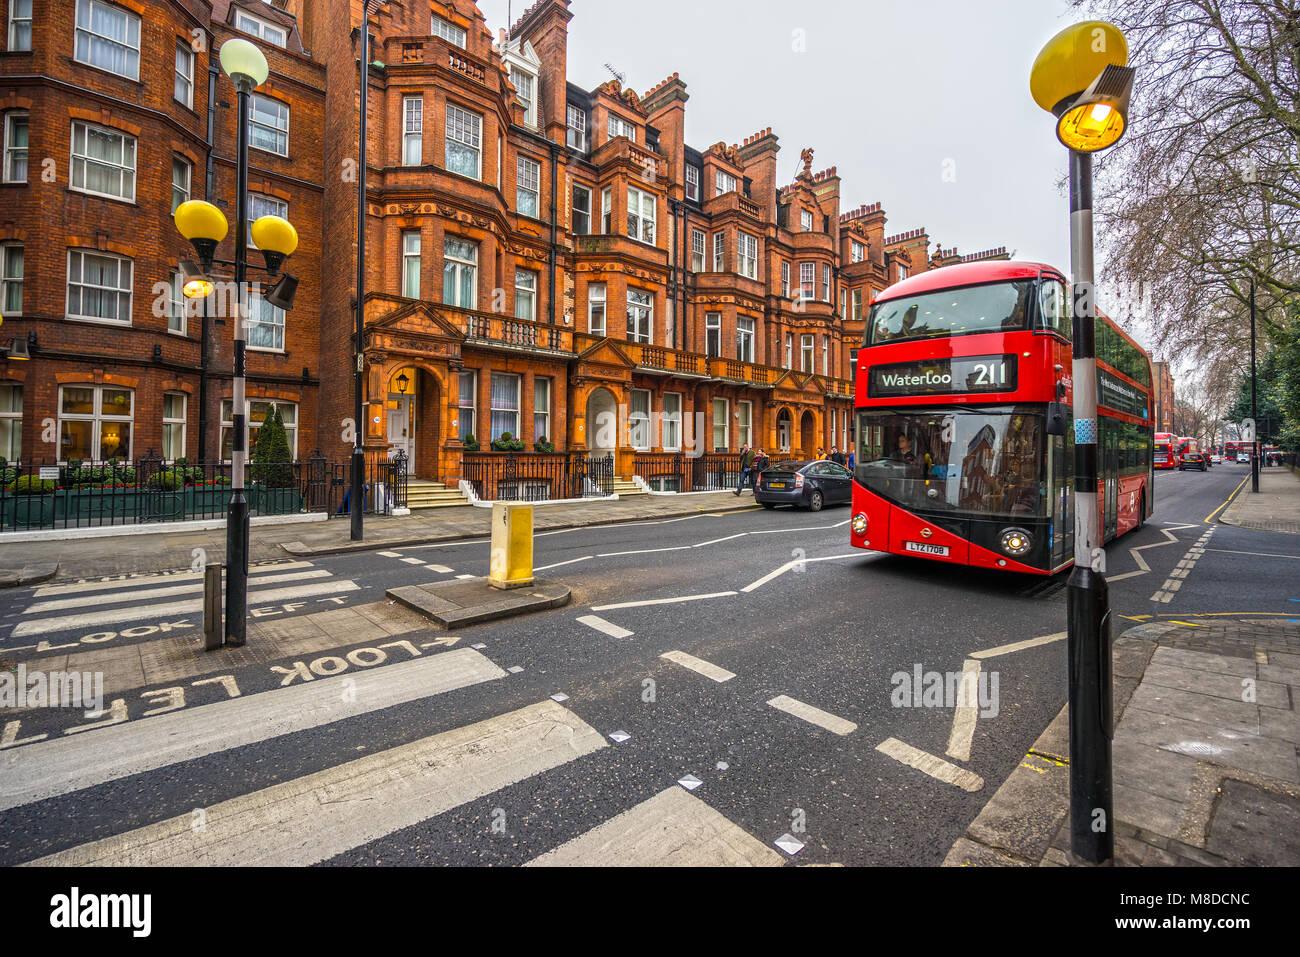 LONDON, UK - JANUARY 26, 2017: Londo, modern double decker bus in Chelsea district. Stock Photo